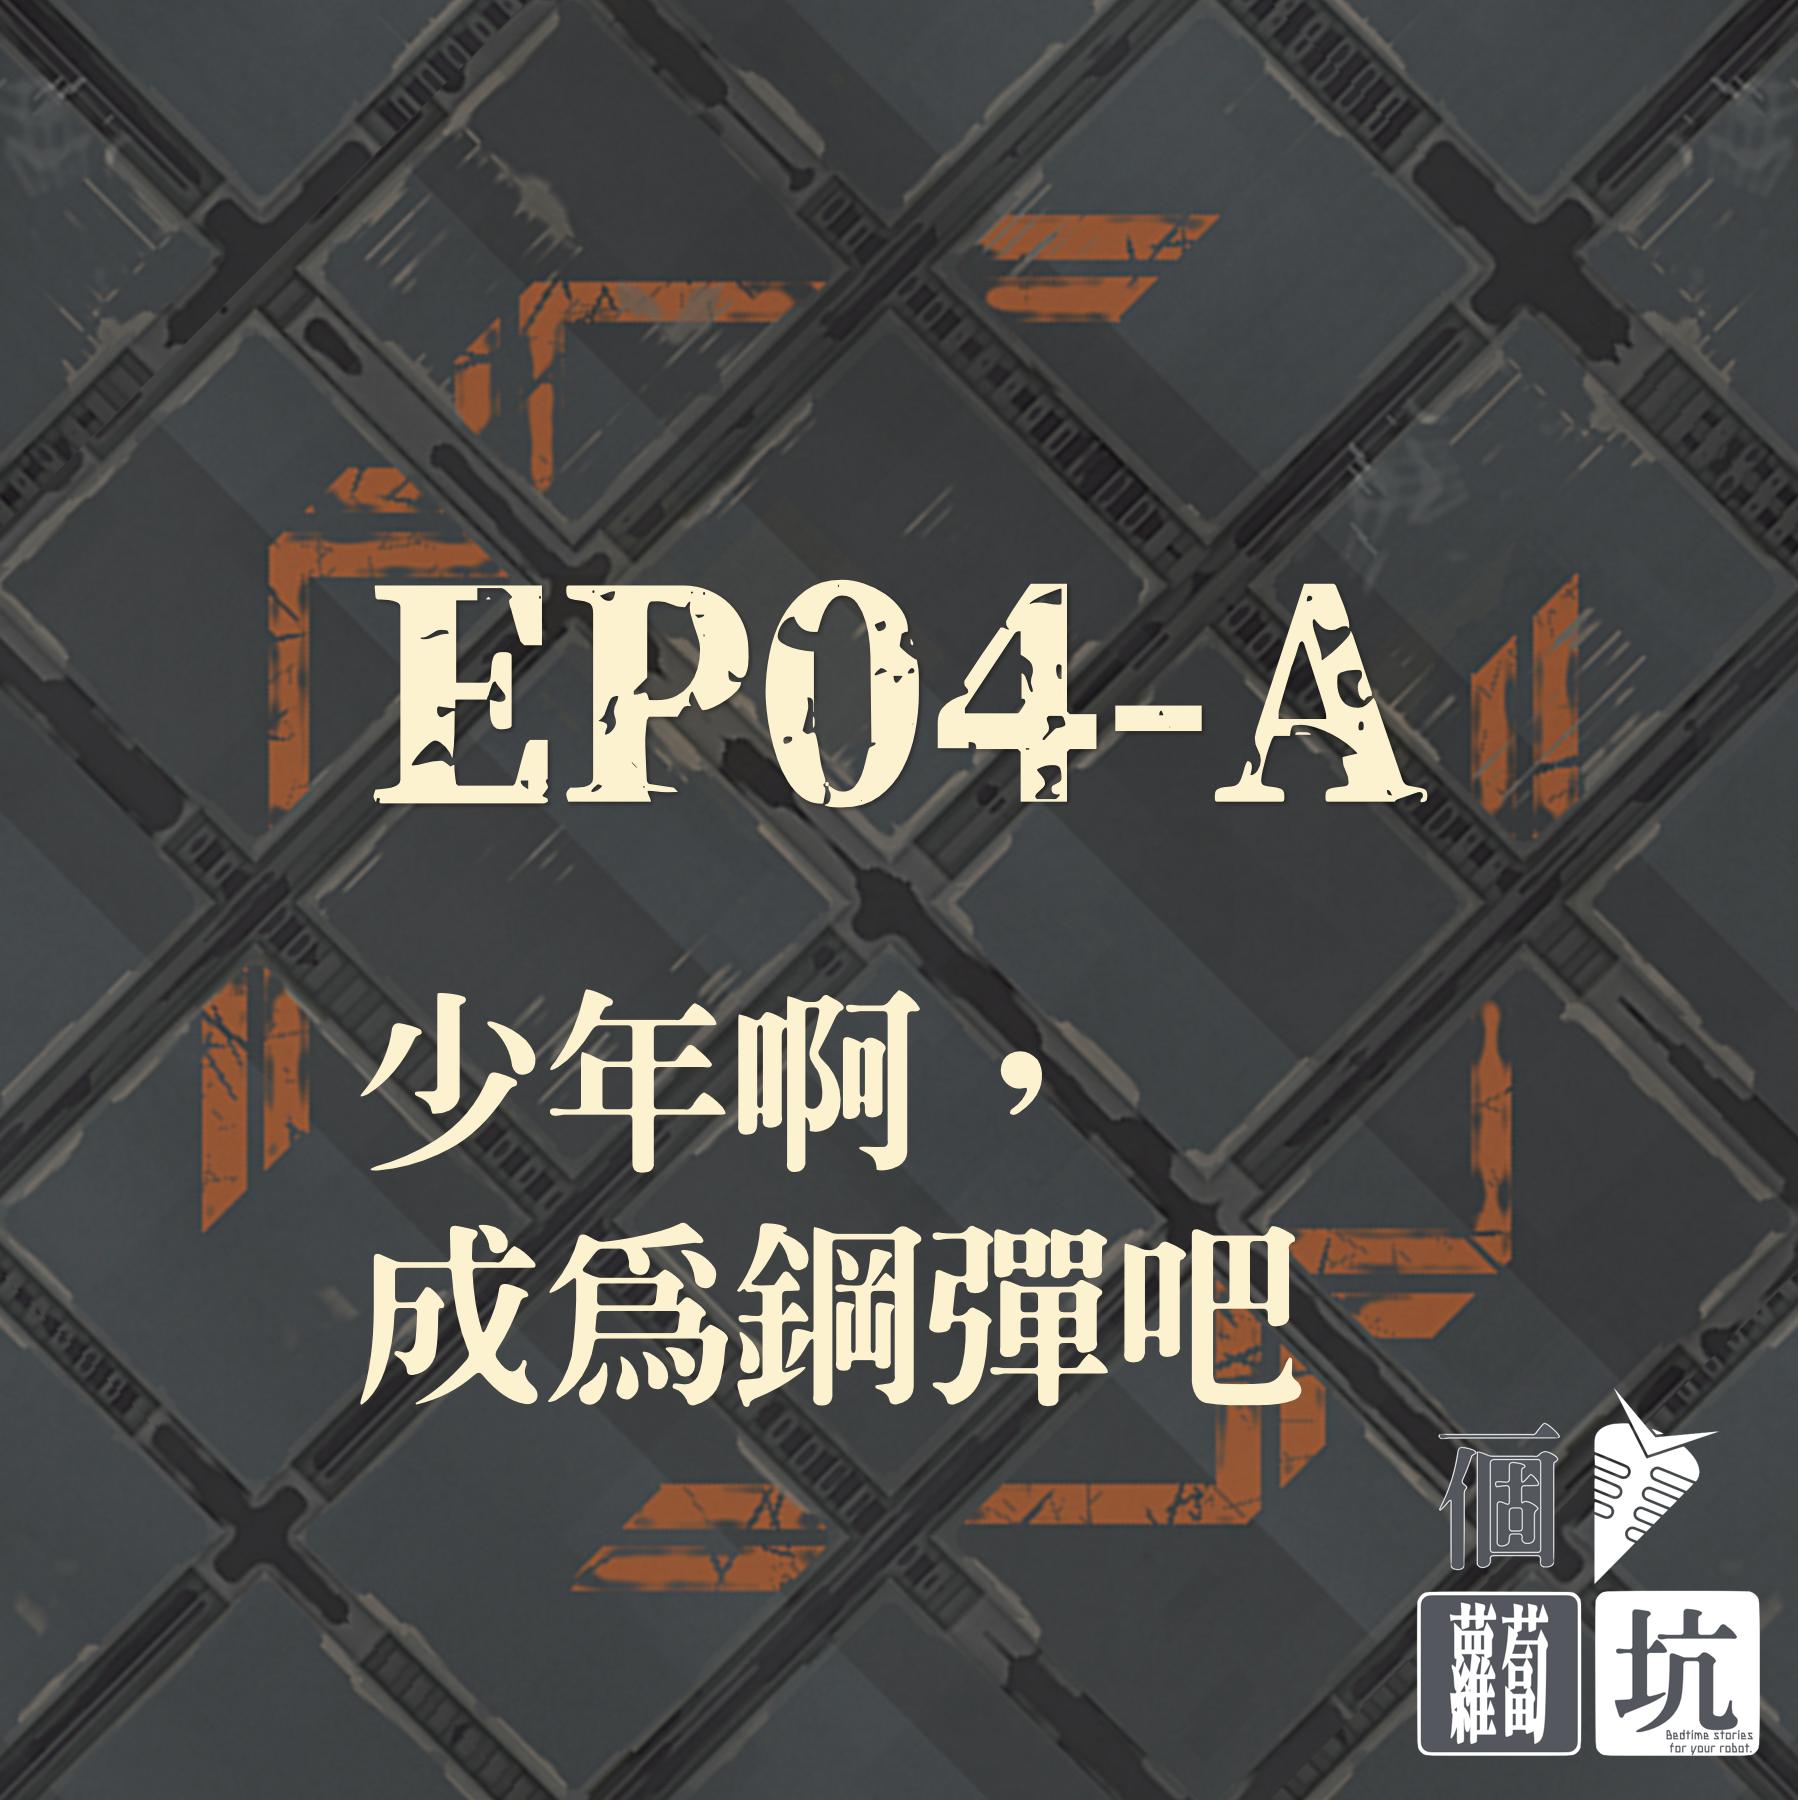 EP04-A:少年啊,成為鋼彈吧!